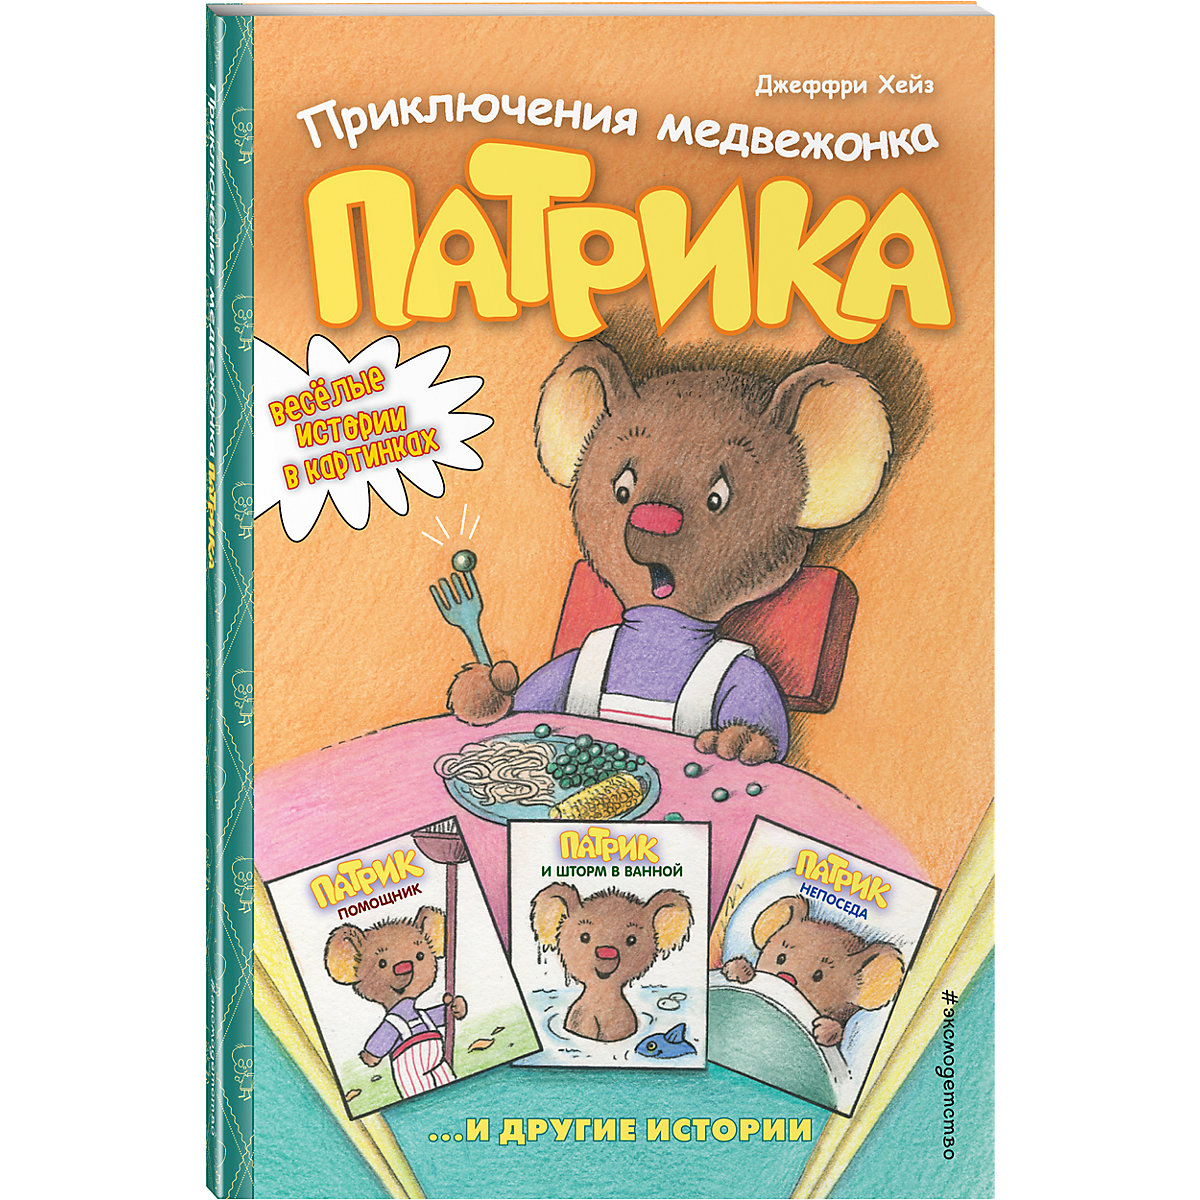 Books EKSMO 10757929 Children Education Encyclopedia Alphabet Dictionary Book For Baby MTpromo